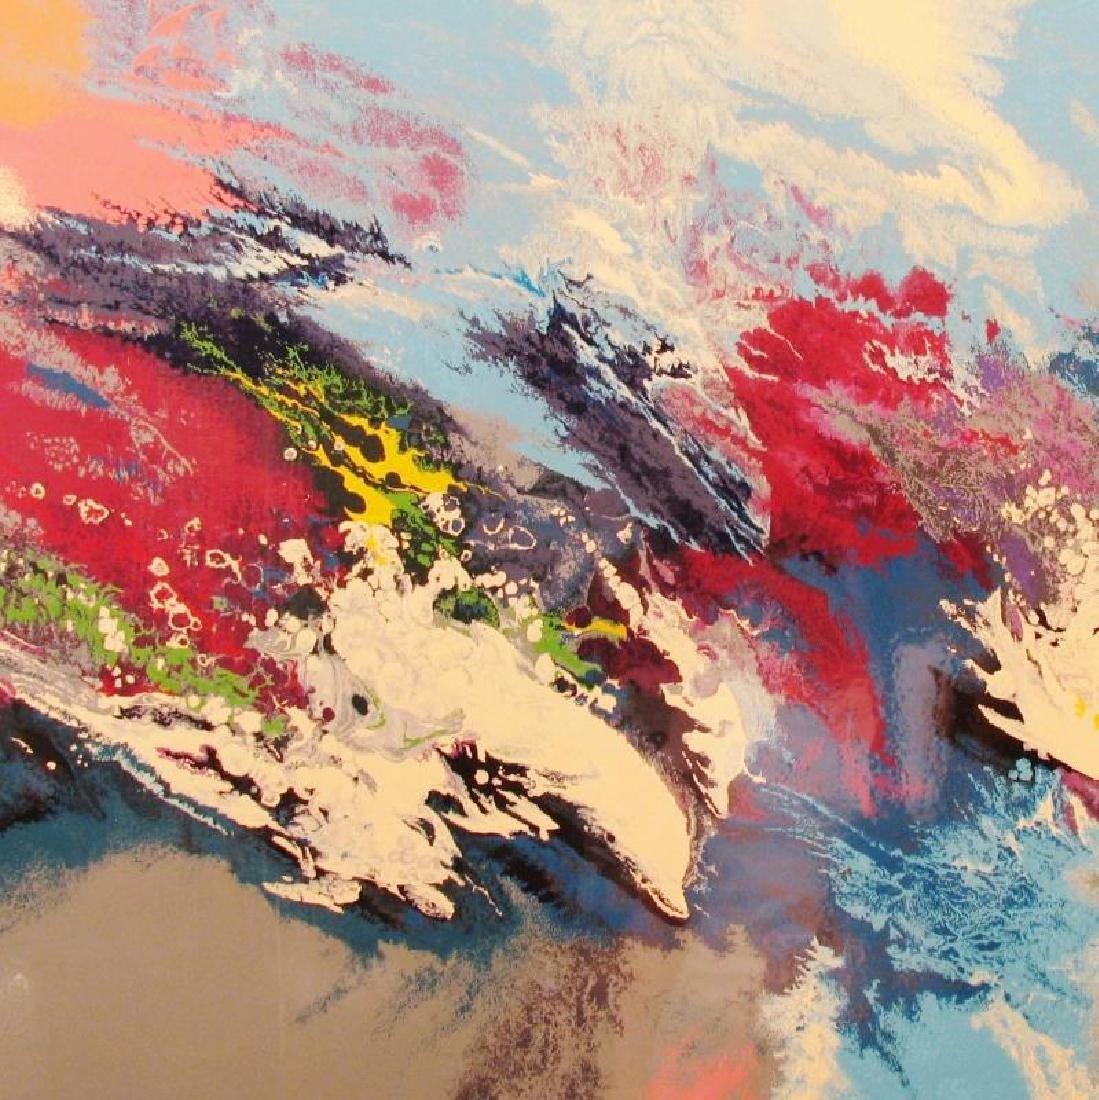 Dolphin Ocean Abstract Pop Ltd Ed Modern Signed Art - 3